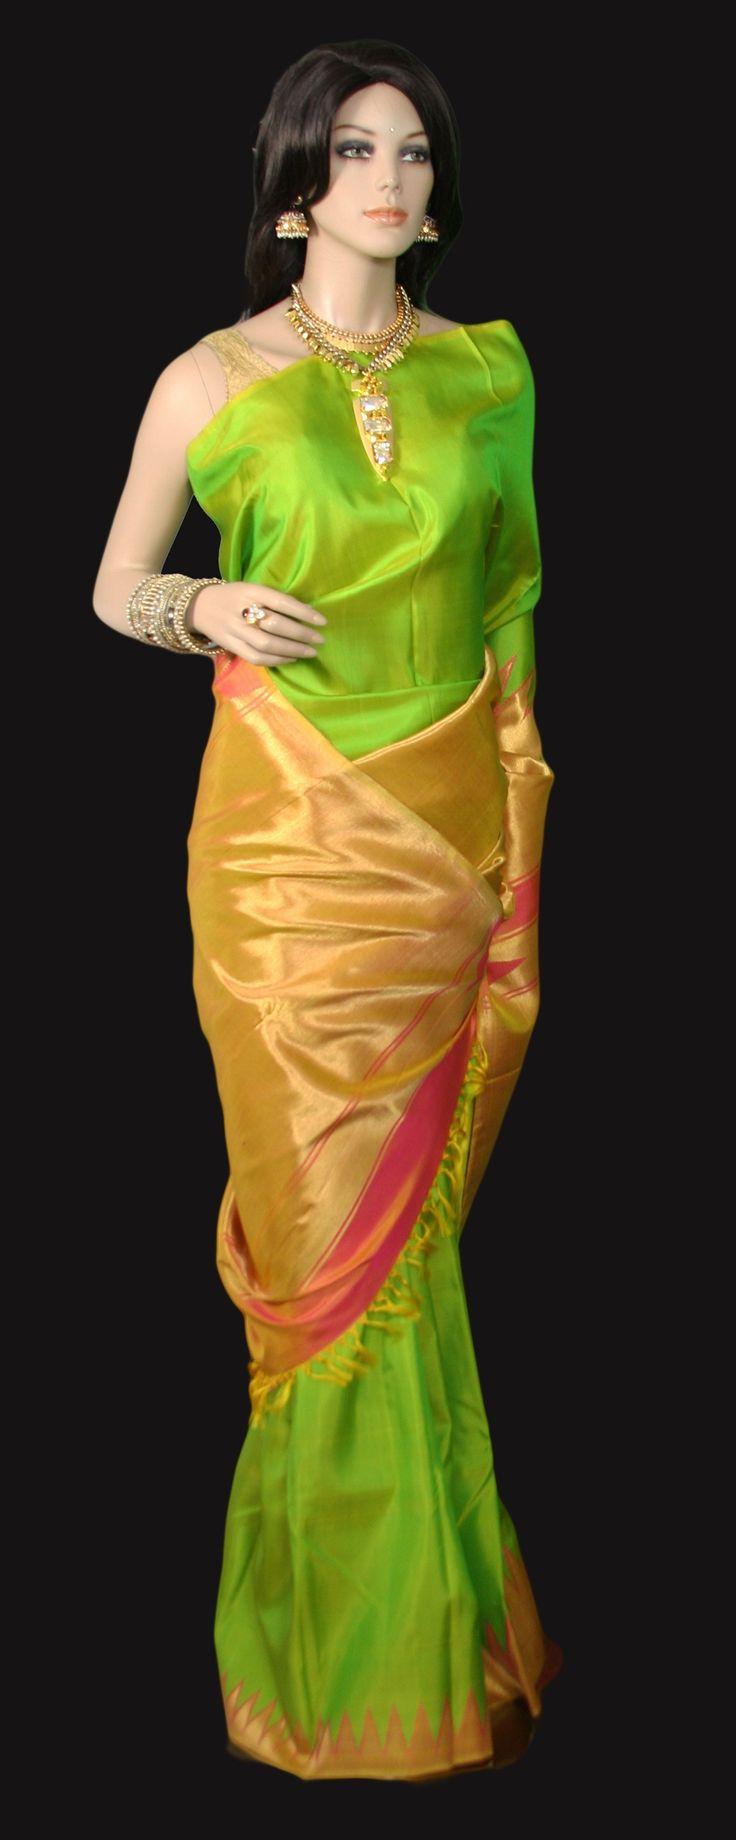 Lime Green Two Tone Kanjeevaram Saree with Rising Temple Border